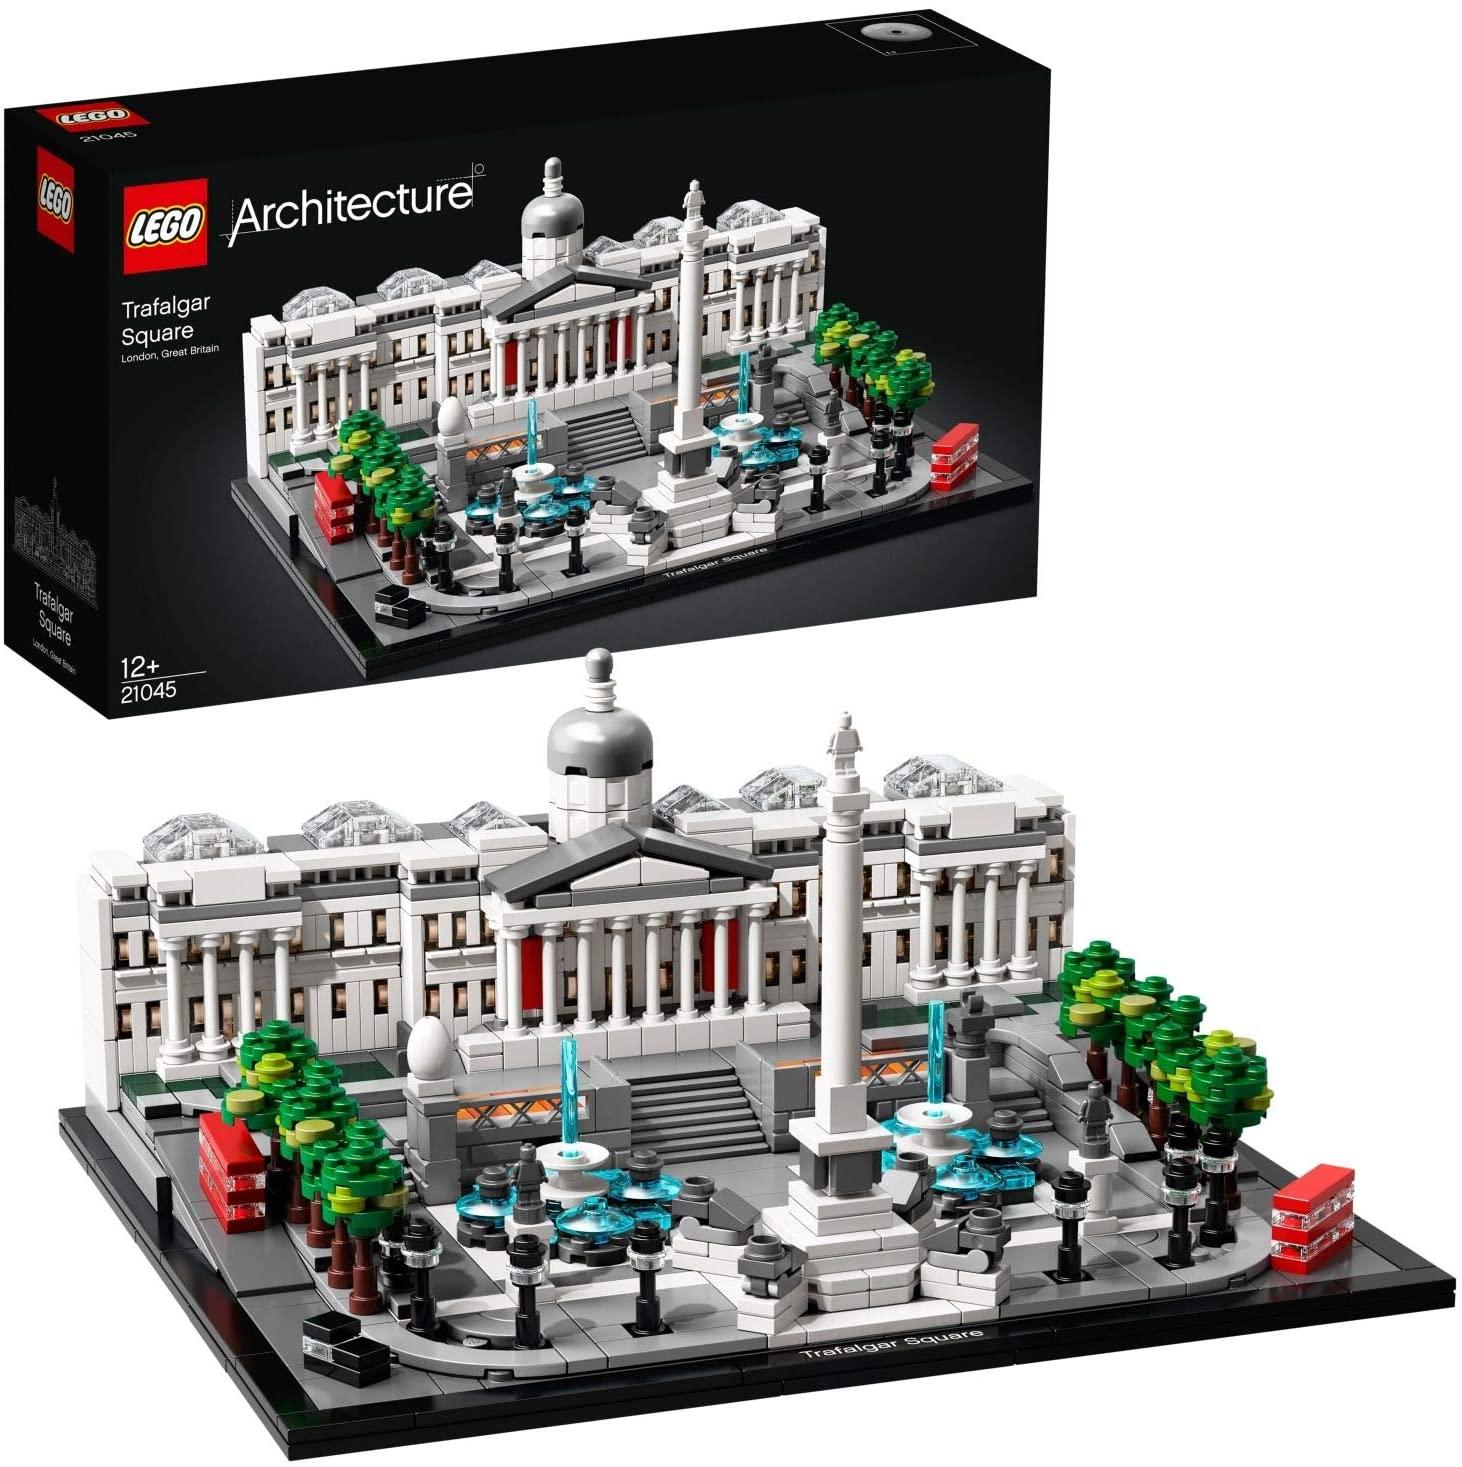 LEGO 21045 Architecture Trafalgar Square Building Set with London Landmark National Gallery £59 at Amazon